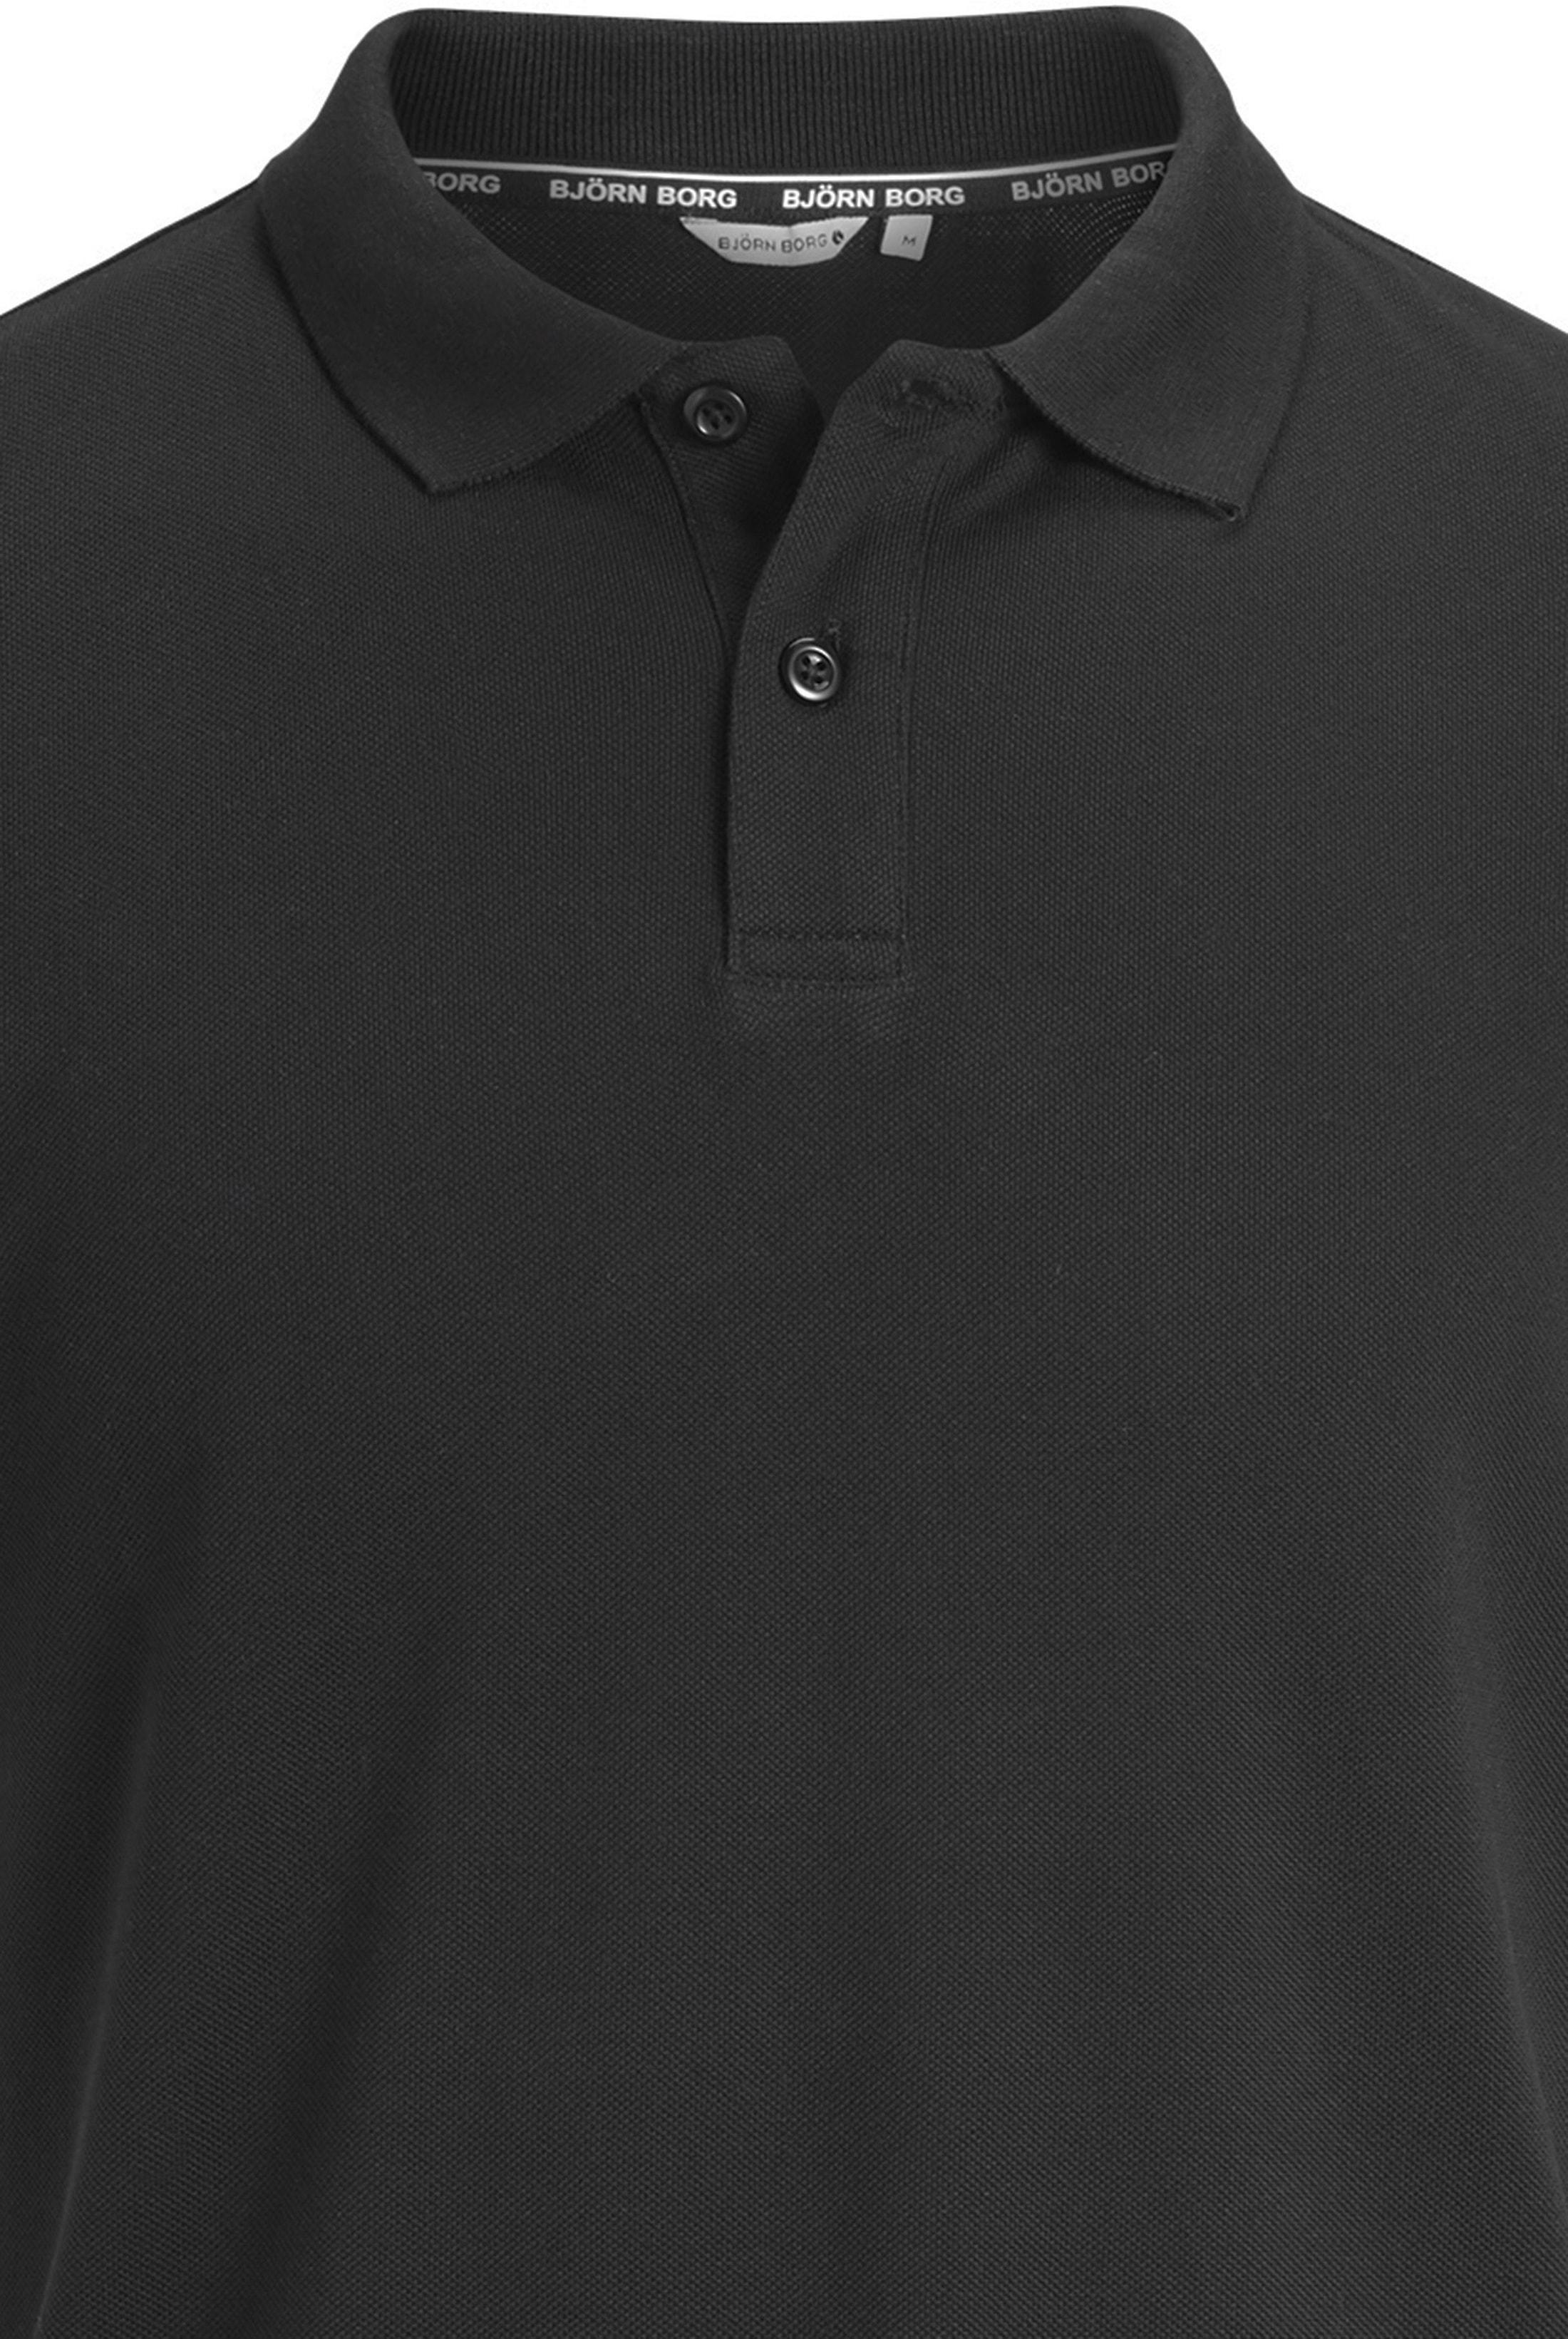 Bjorn Borg Poloshirt Black Beauty foto 1